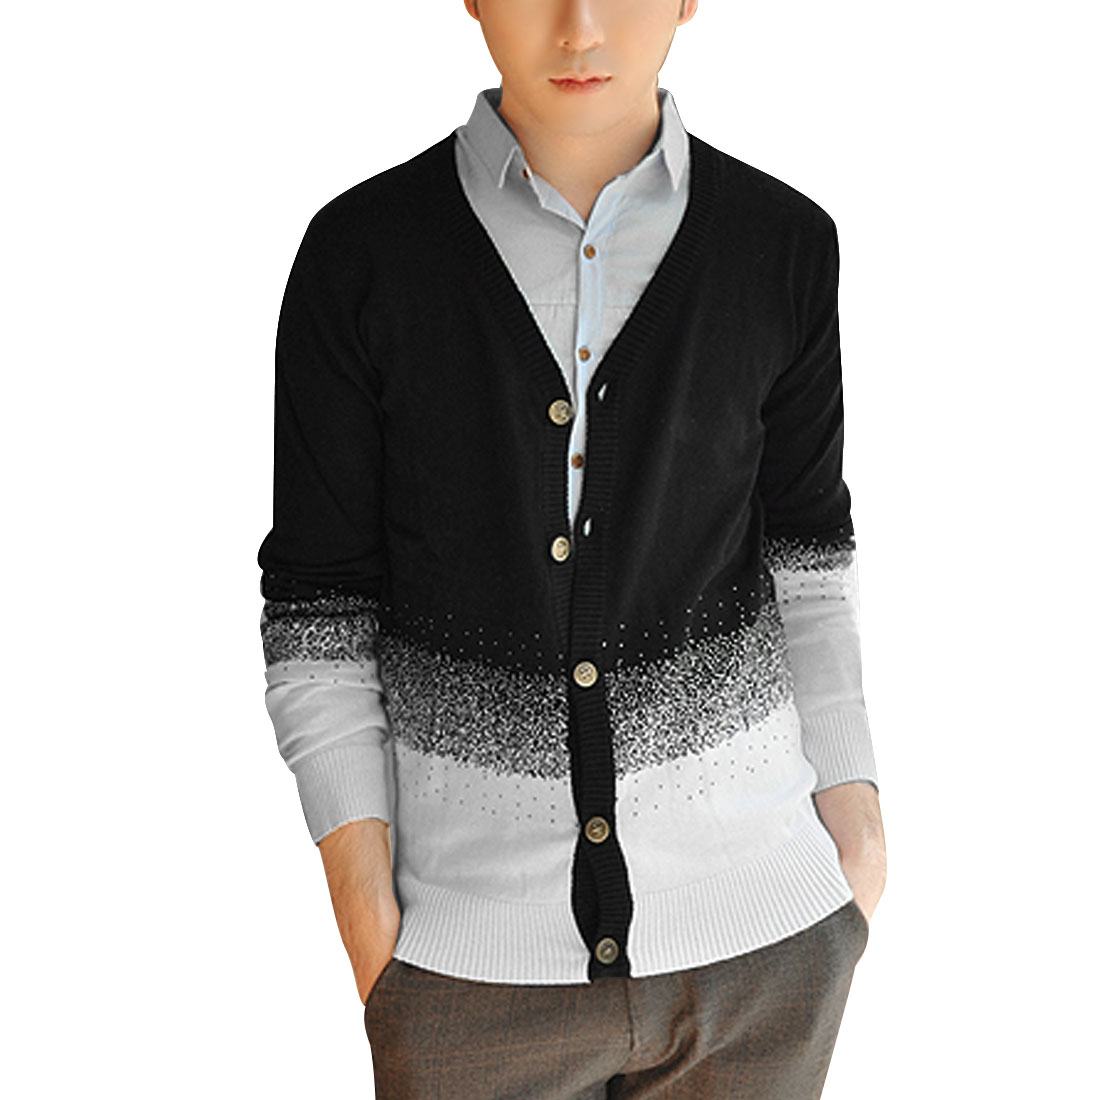 Mens Black White Fashion New Fashion Gradient Tone Details Knit Cardigan S